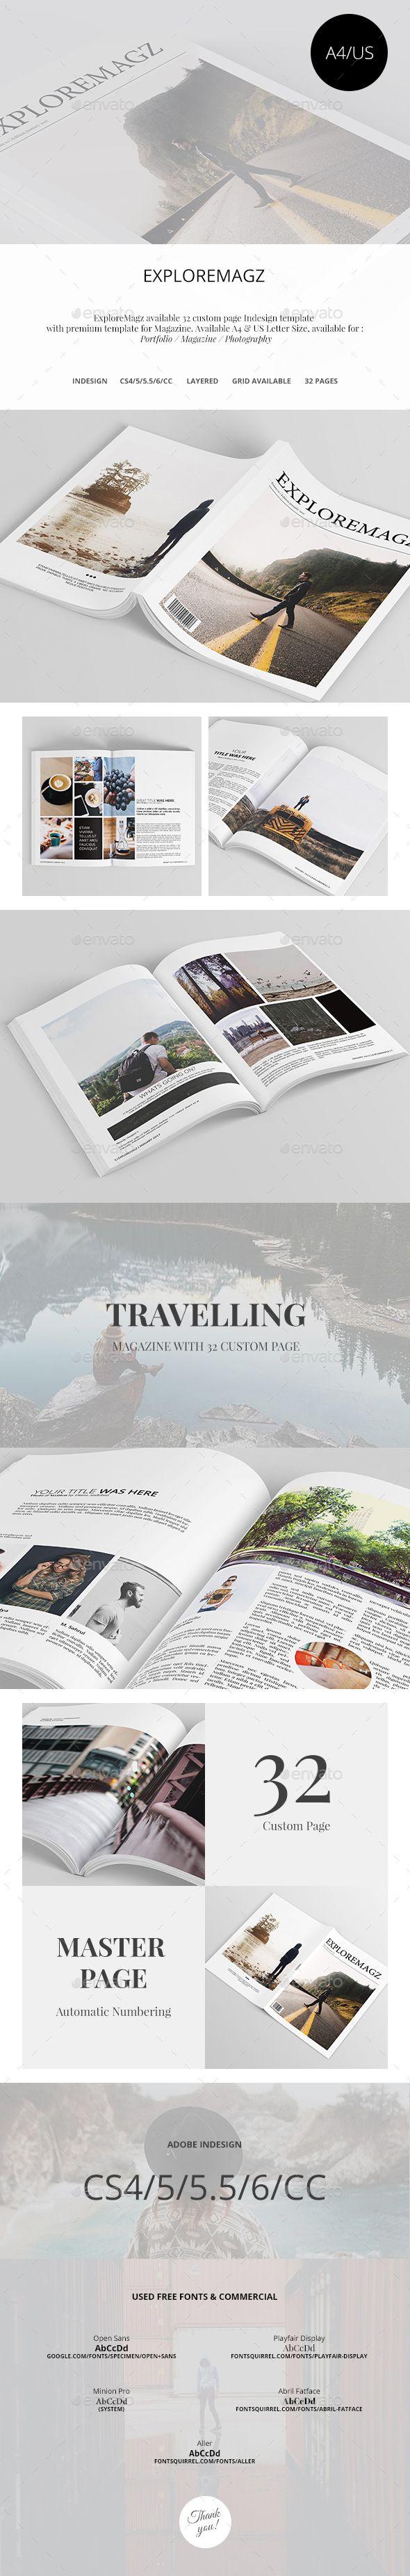 Exploremagz Magazine Template InDesign INDD #design Download: http://graphicriver.net/item/exploremagz-magazine/14404230?ref=ksioks